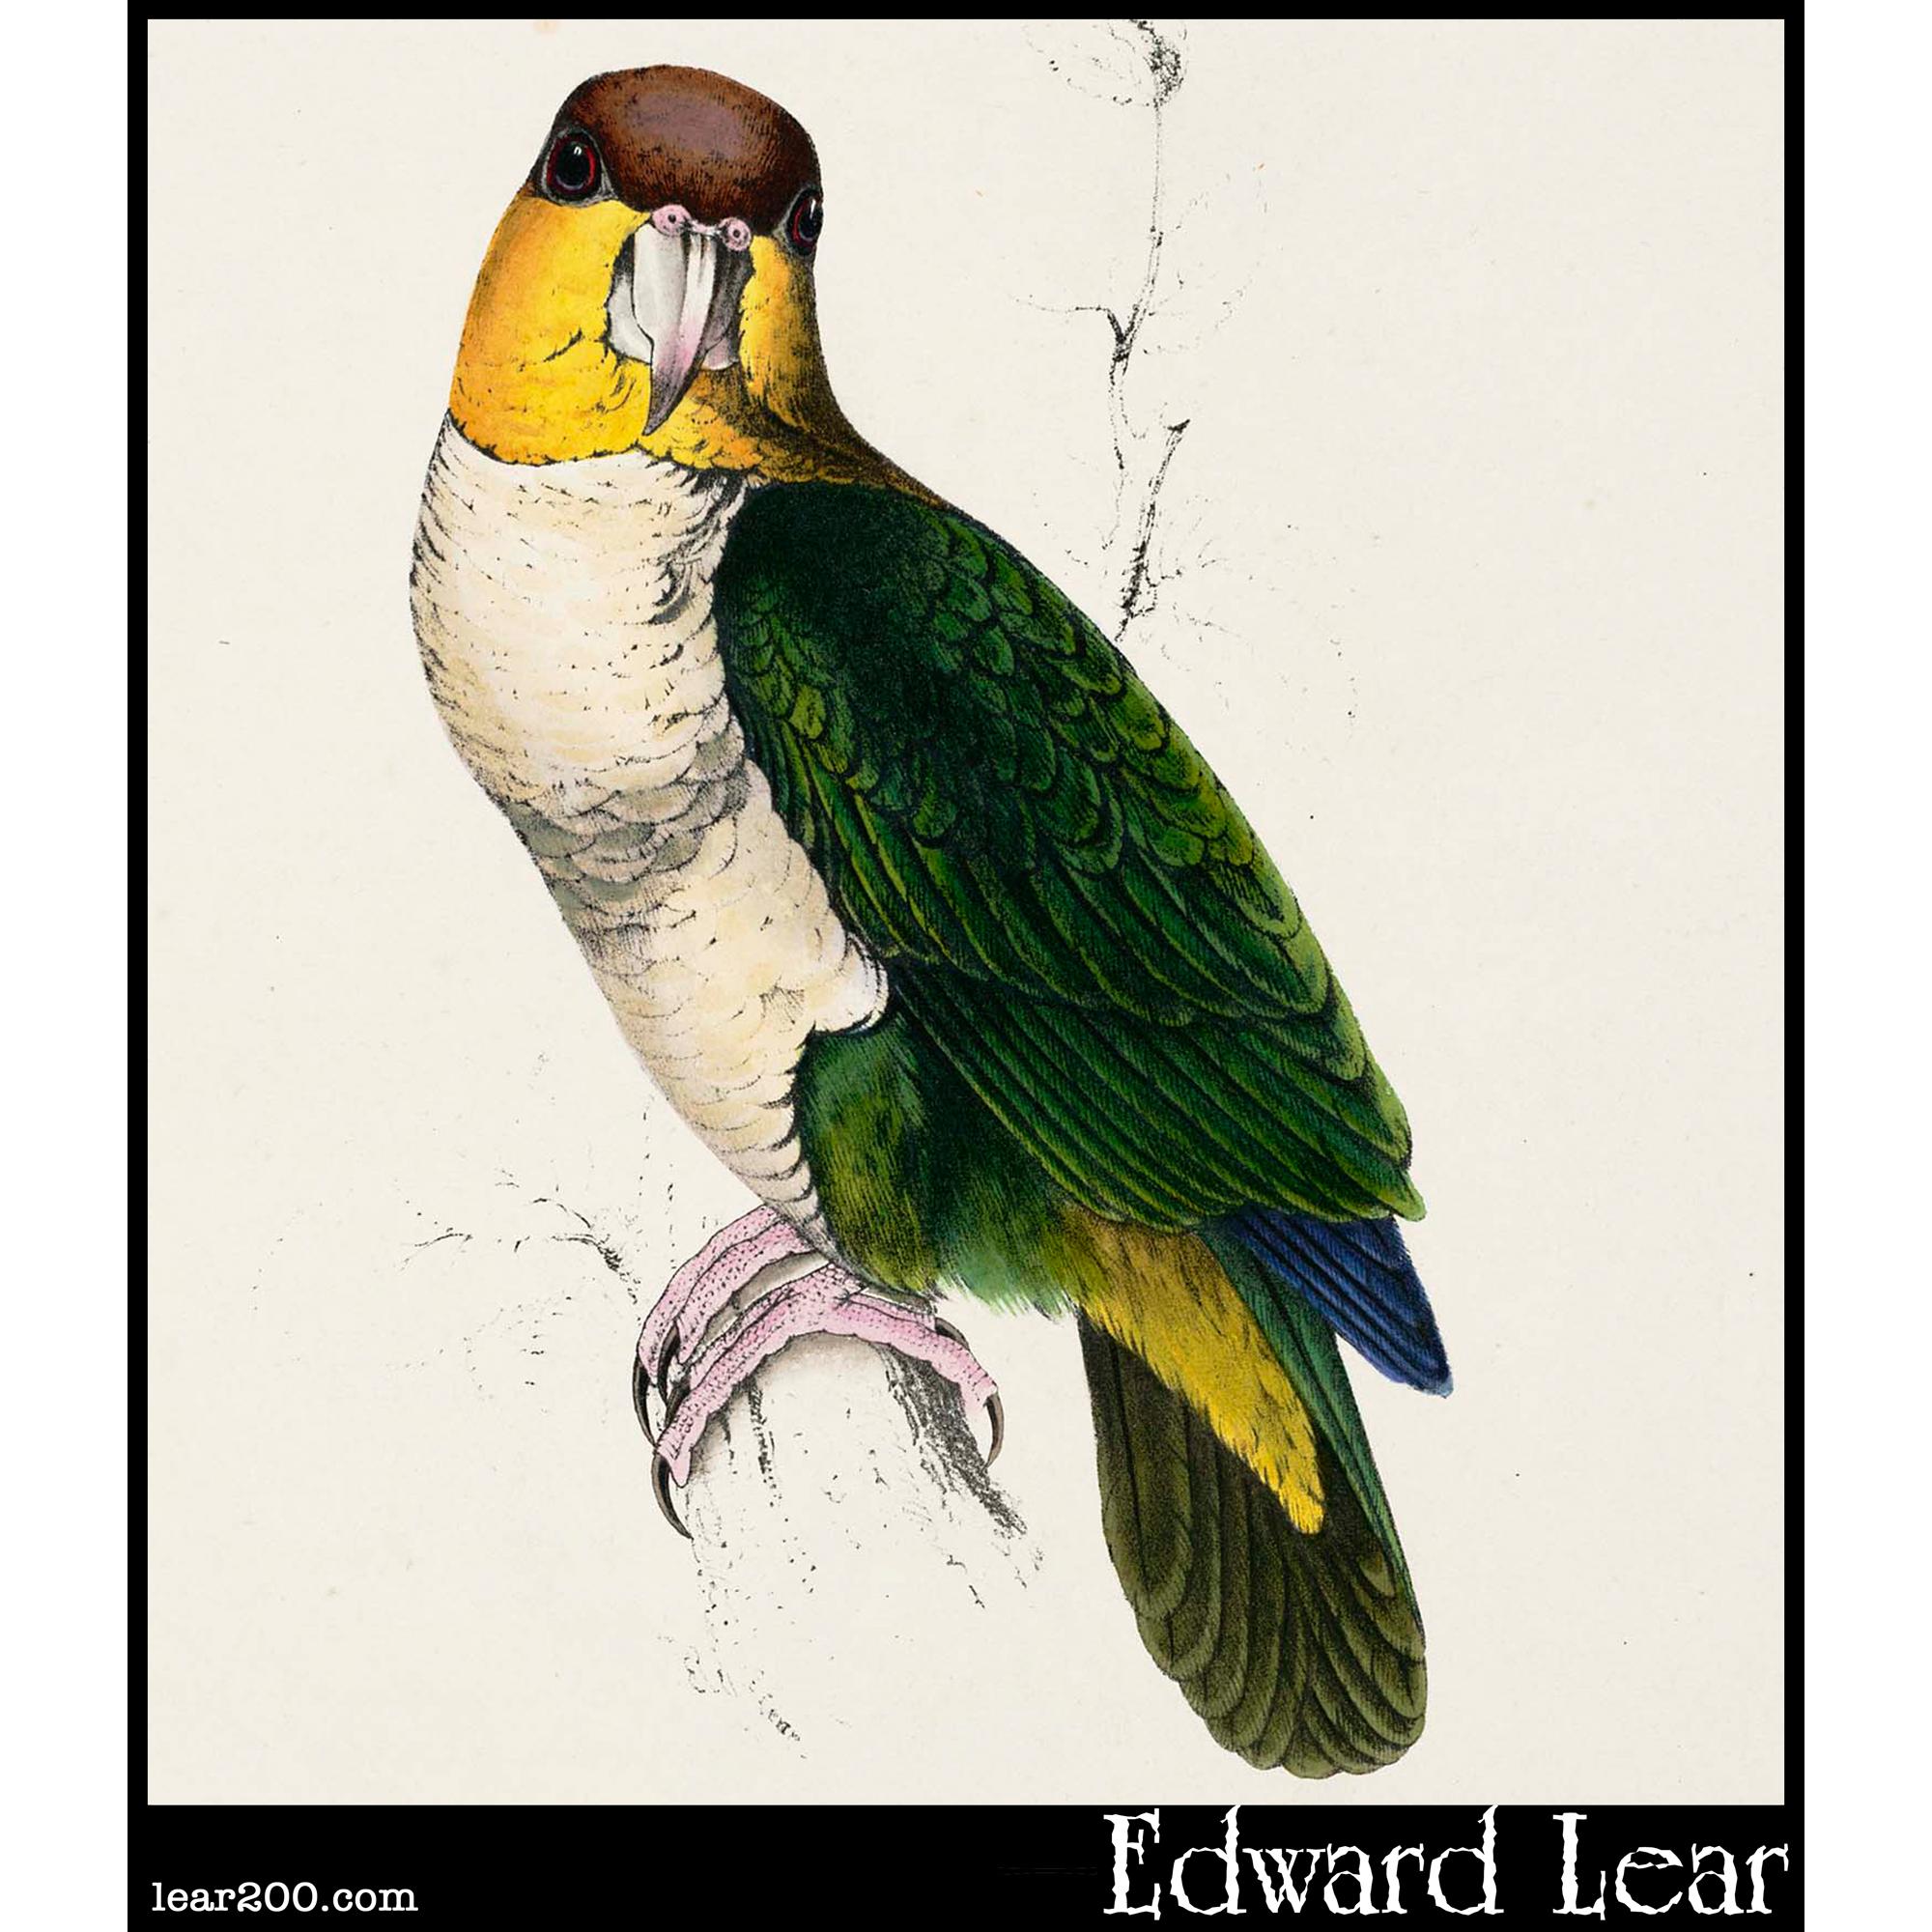 Psittacus Badiceps, the Bay-headed Parrot